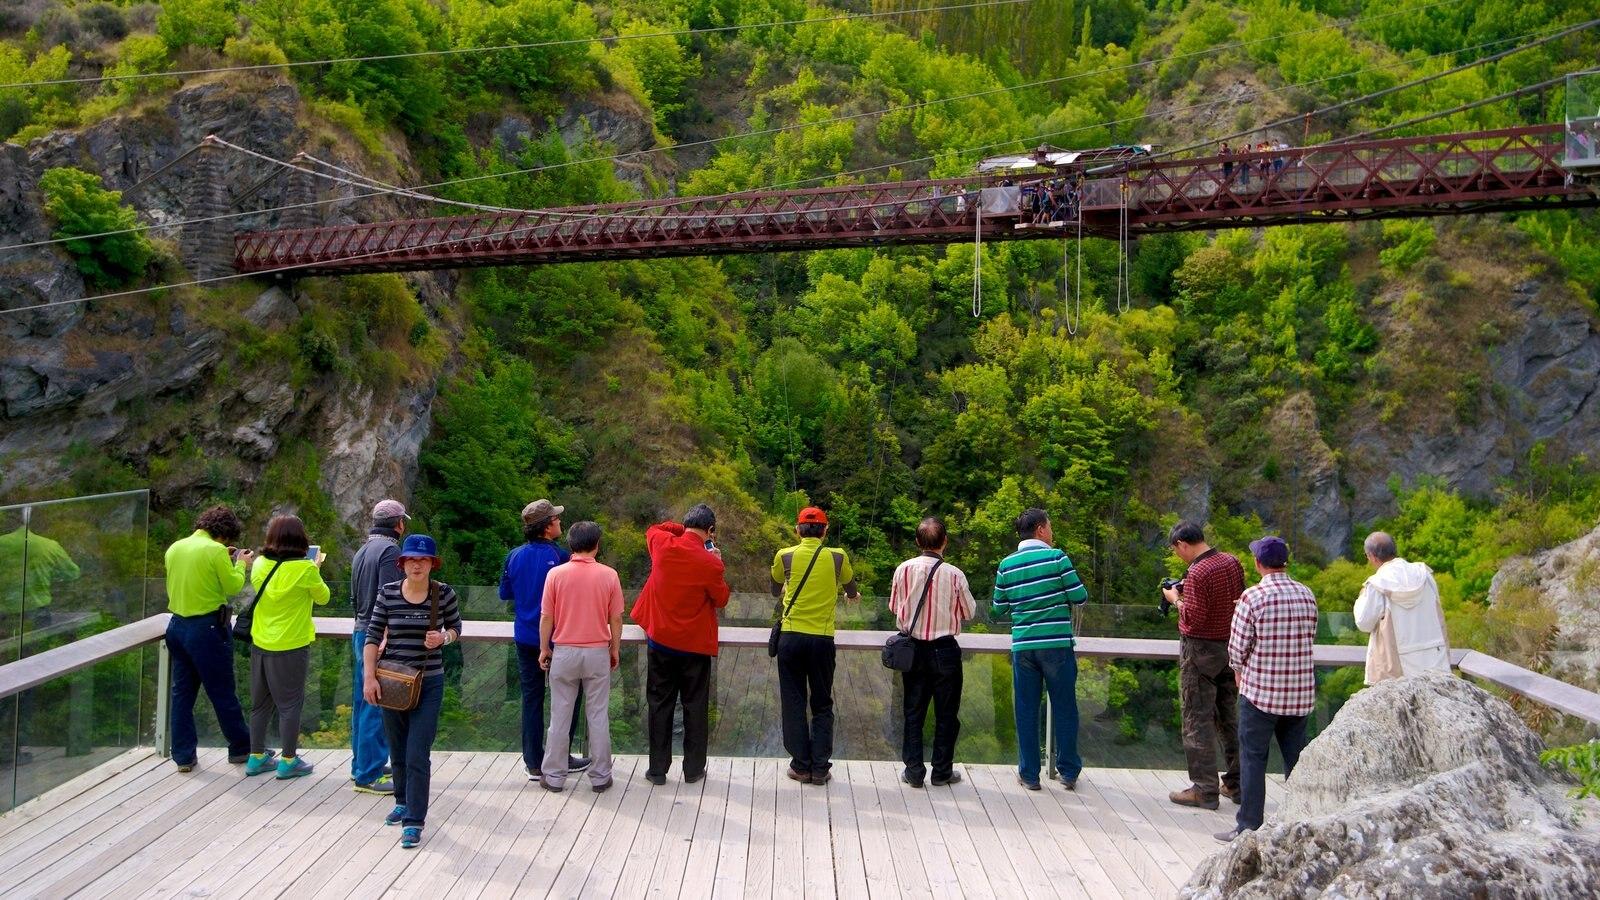 Kawarau Suspension Bridge showing a bridge, hiking or walking and views